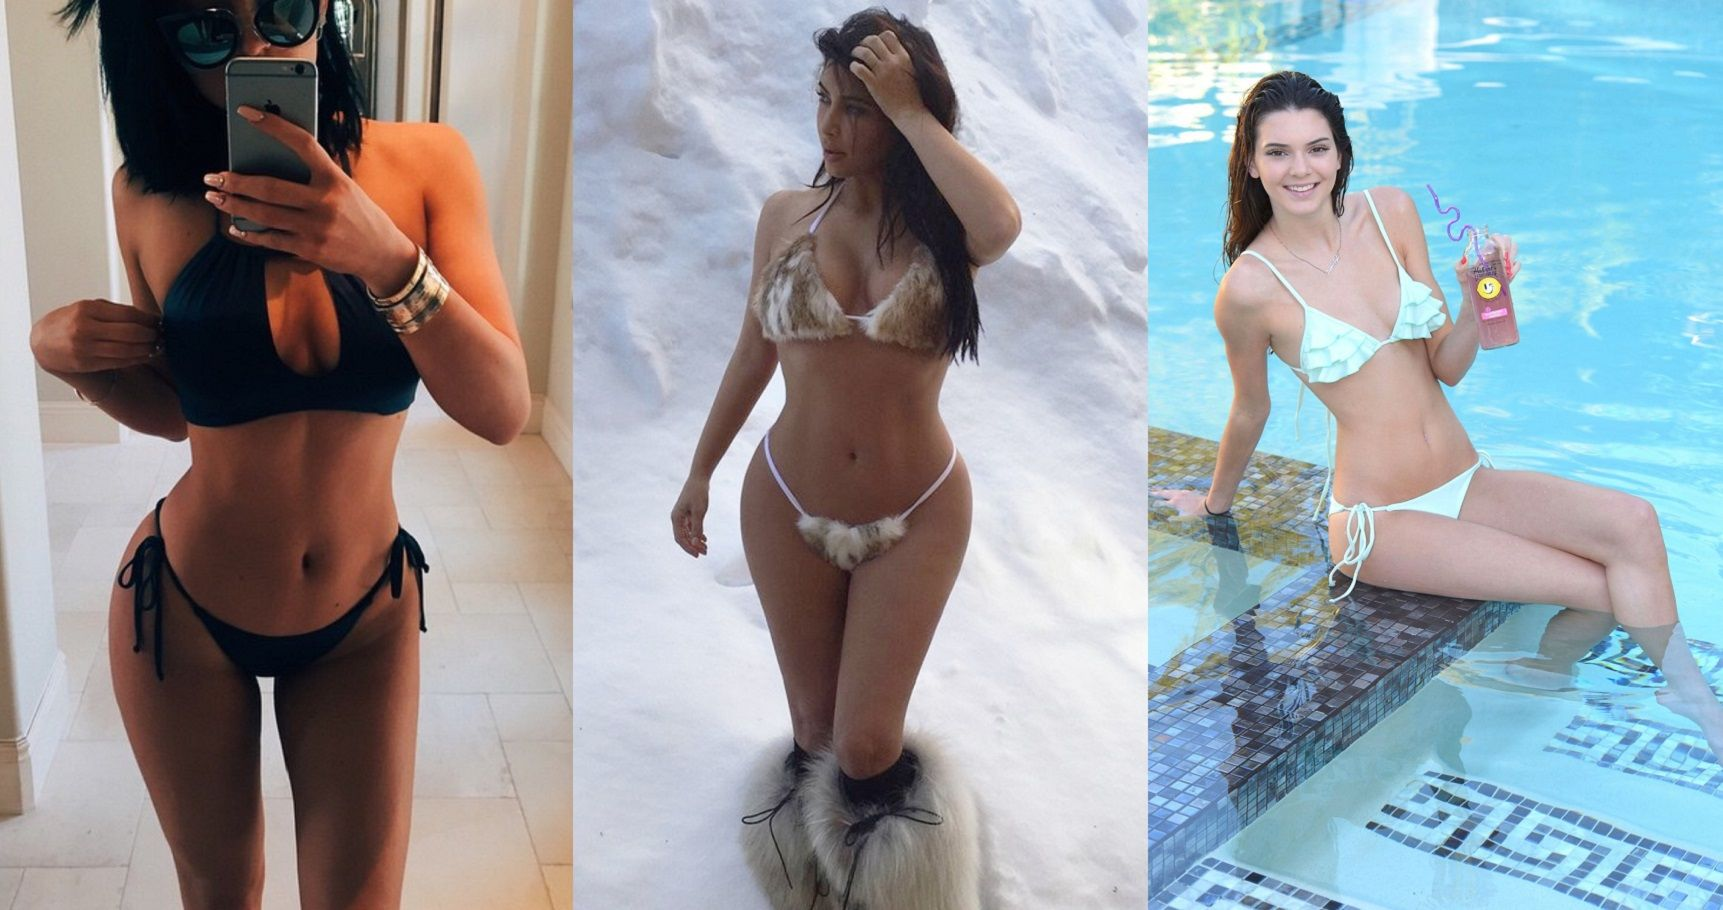 Top 18 Hottest Kardashian/Jenner Bikini Pictures